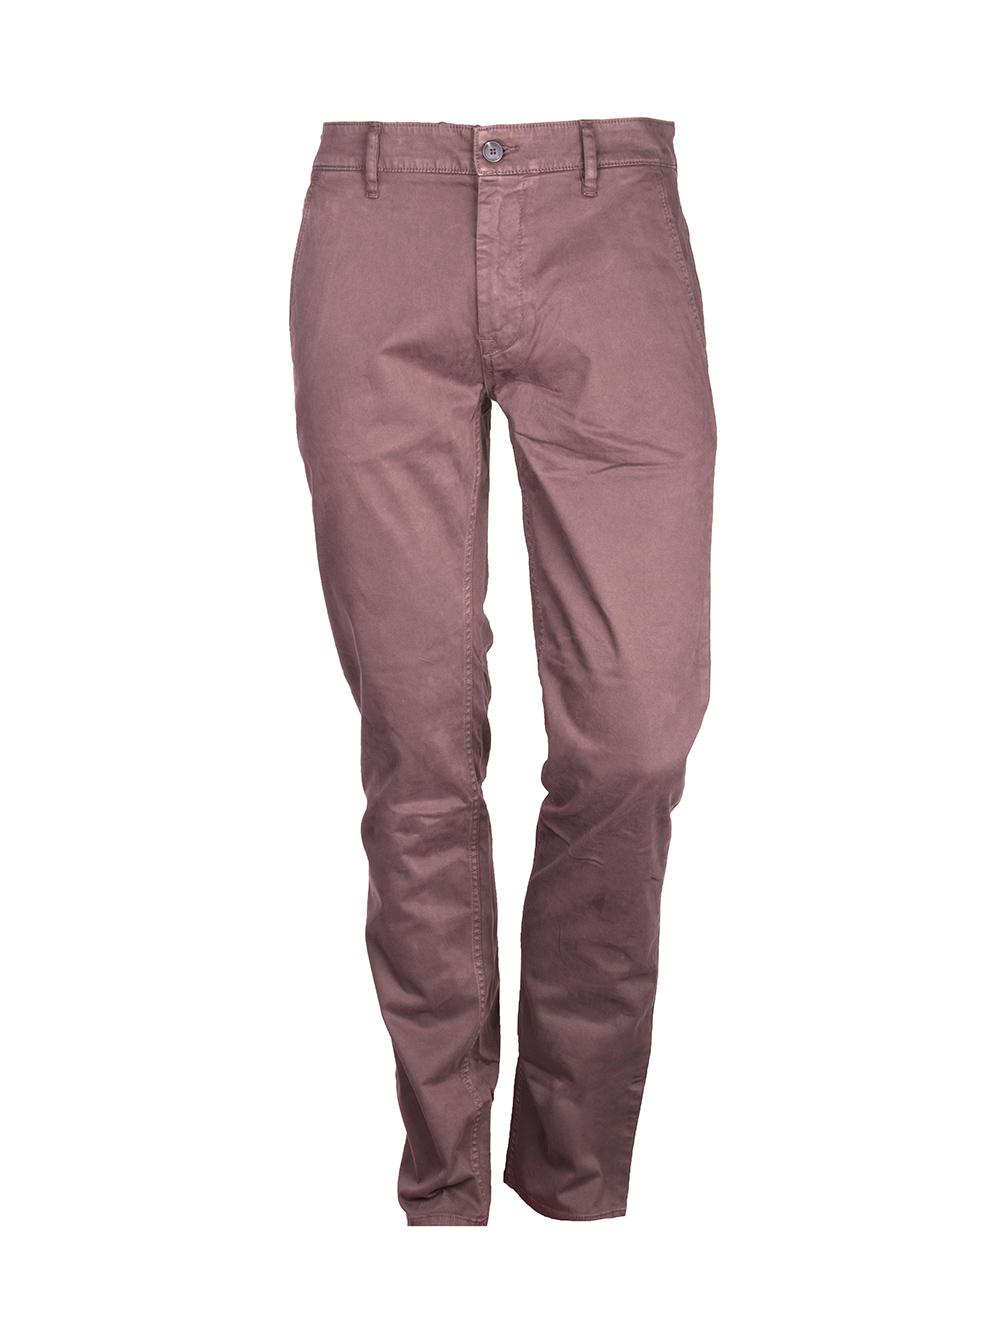 BOSS Παντελόνι άπιετο SCHINO SLIM 79152-20 ΚΑΦΕ